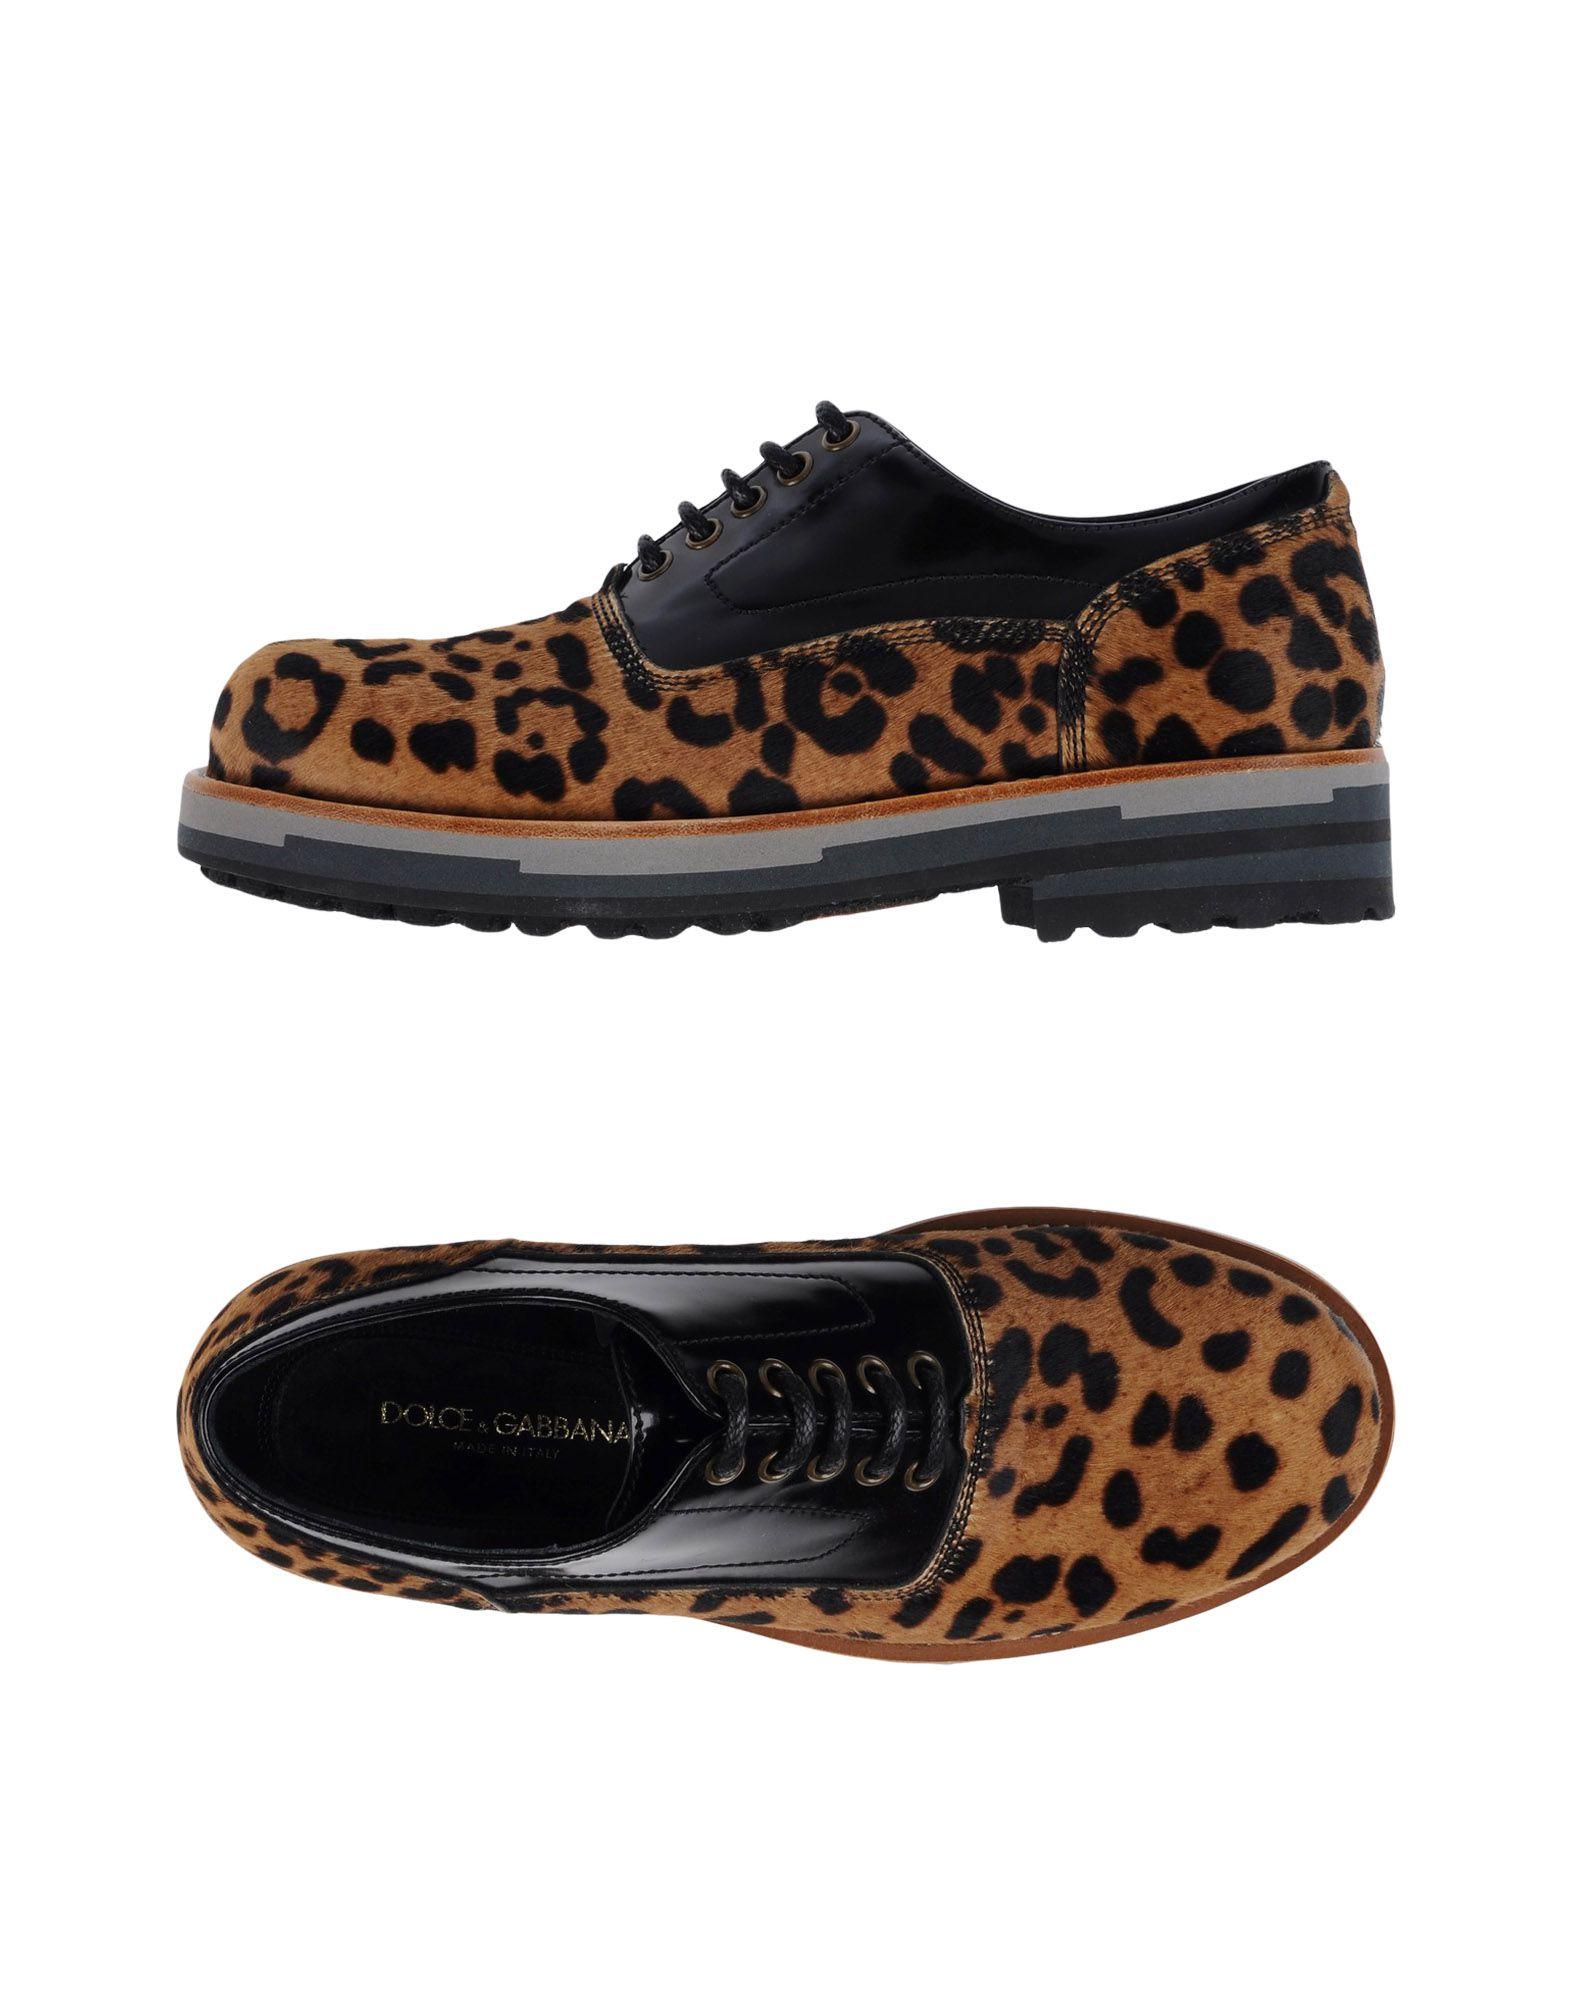 Stringate Dolce & Gabbana Uomo - 11315904QP